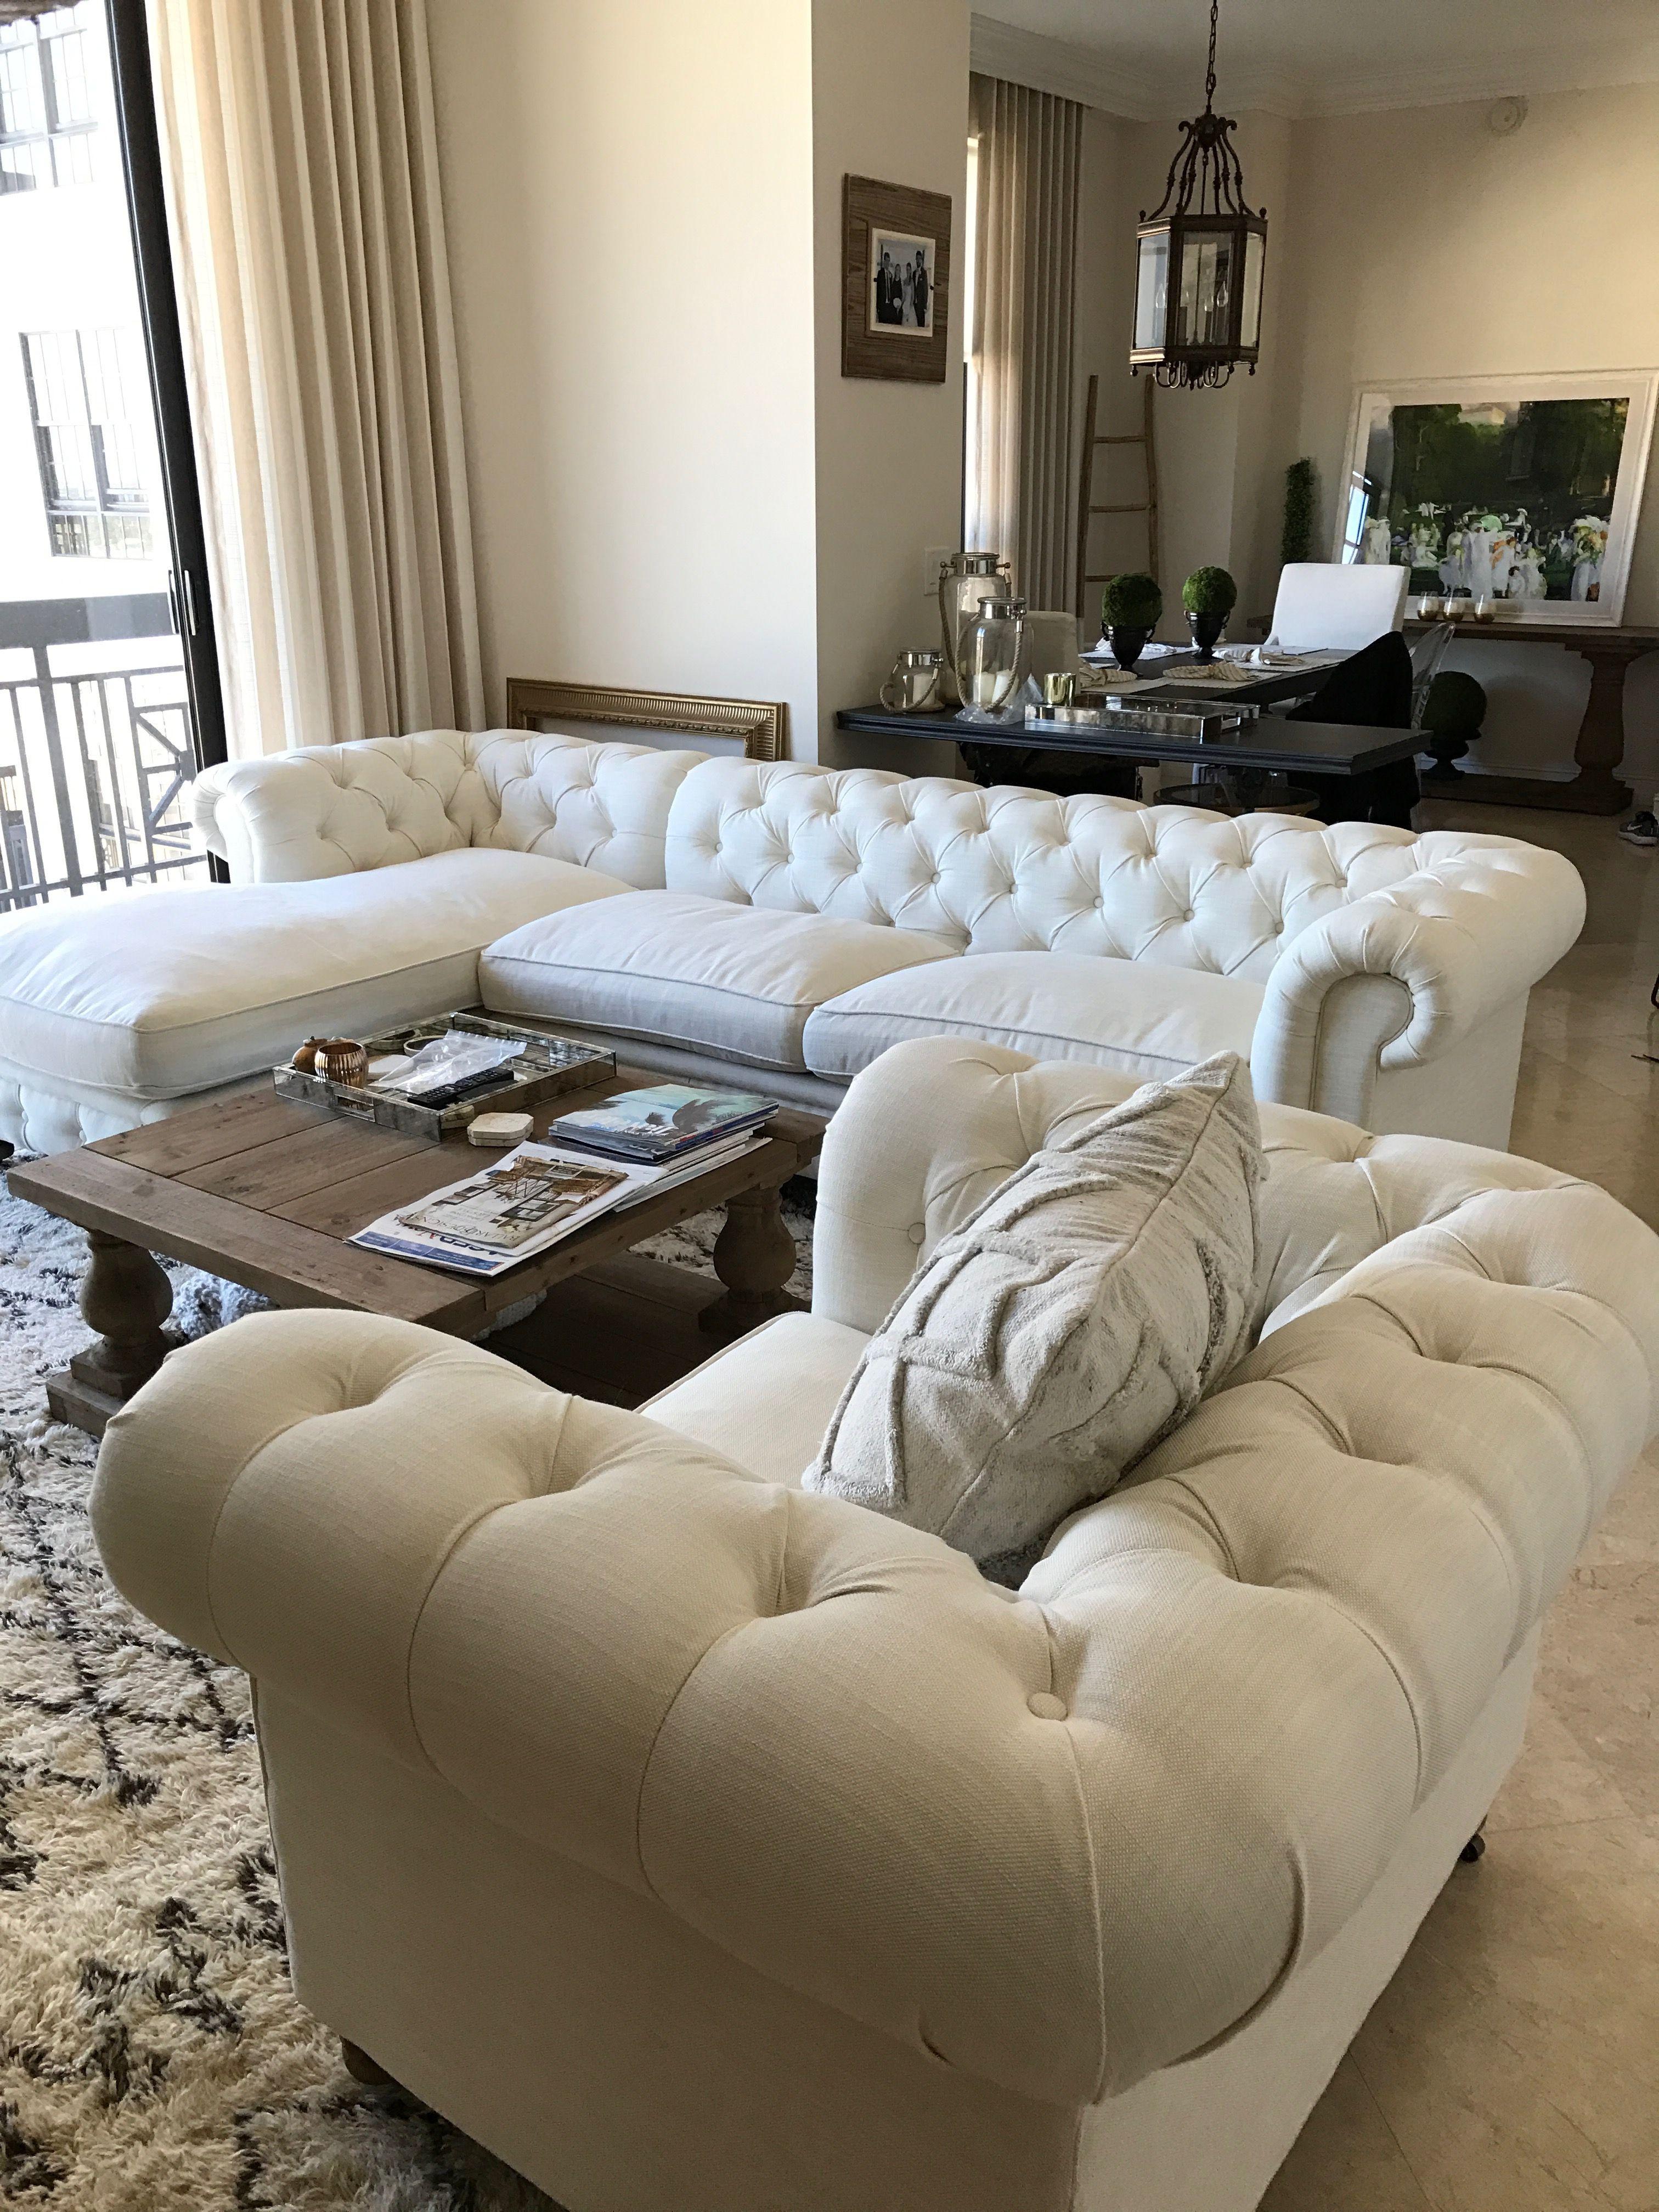 Restoration Hardware Kensington Sofa And Chair Paint Color Divine White Sherwin Williams Beige Sofa Living Room Beige Living Rooms Beige And White Living Room #paint #my #living #room